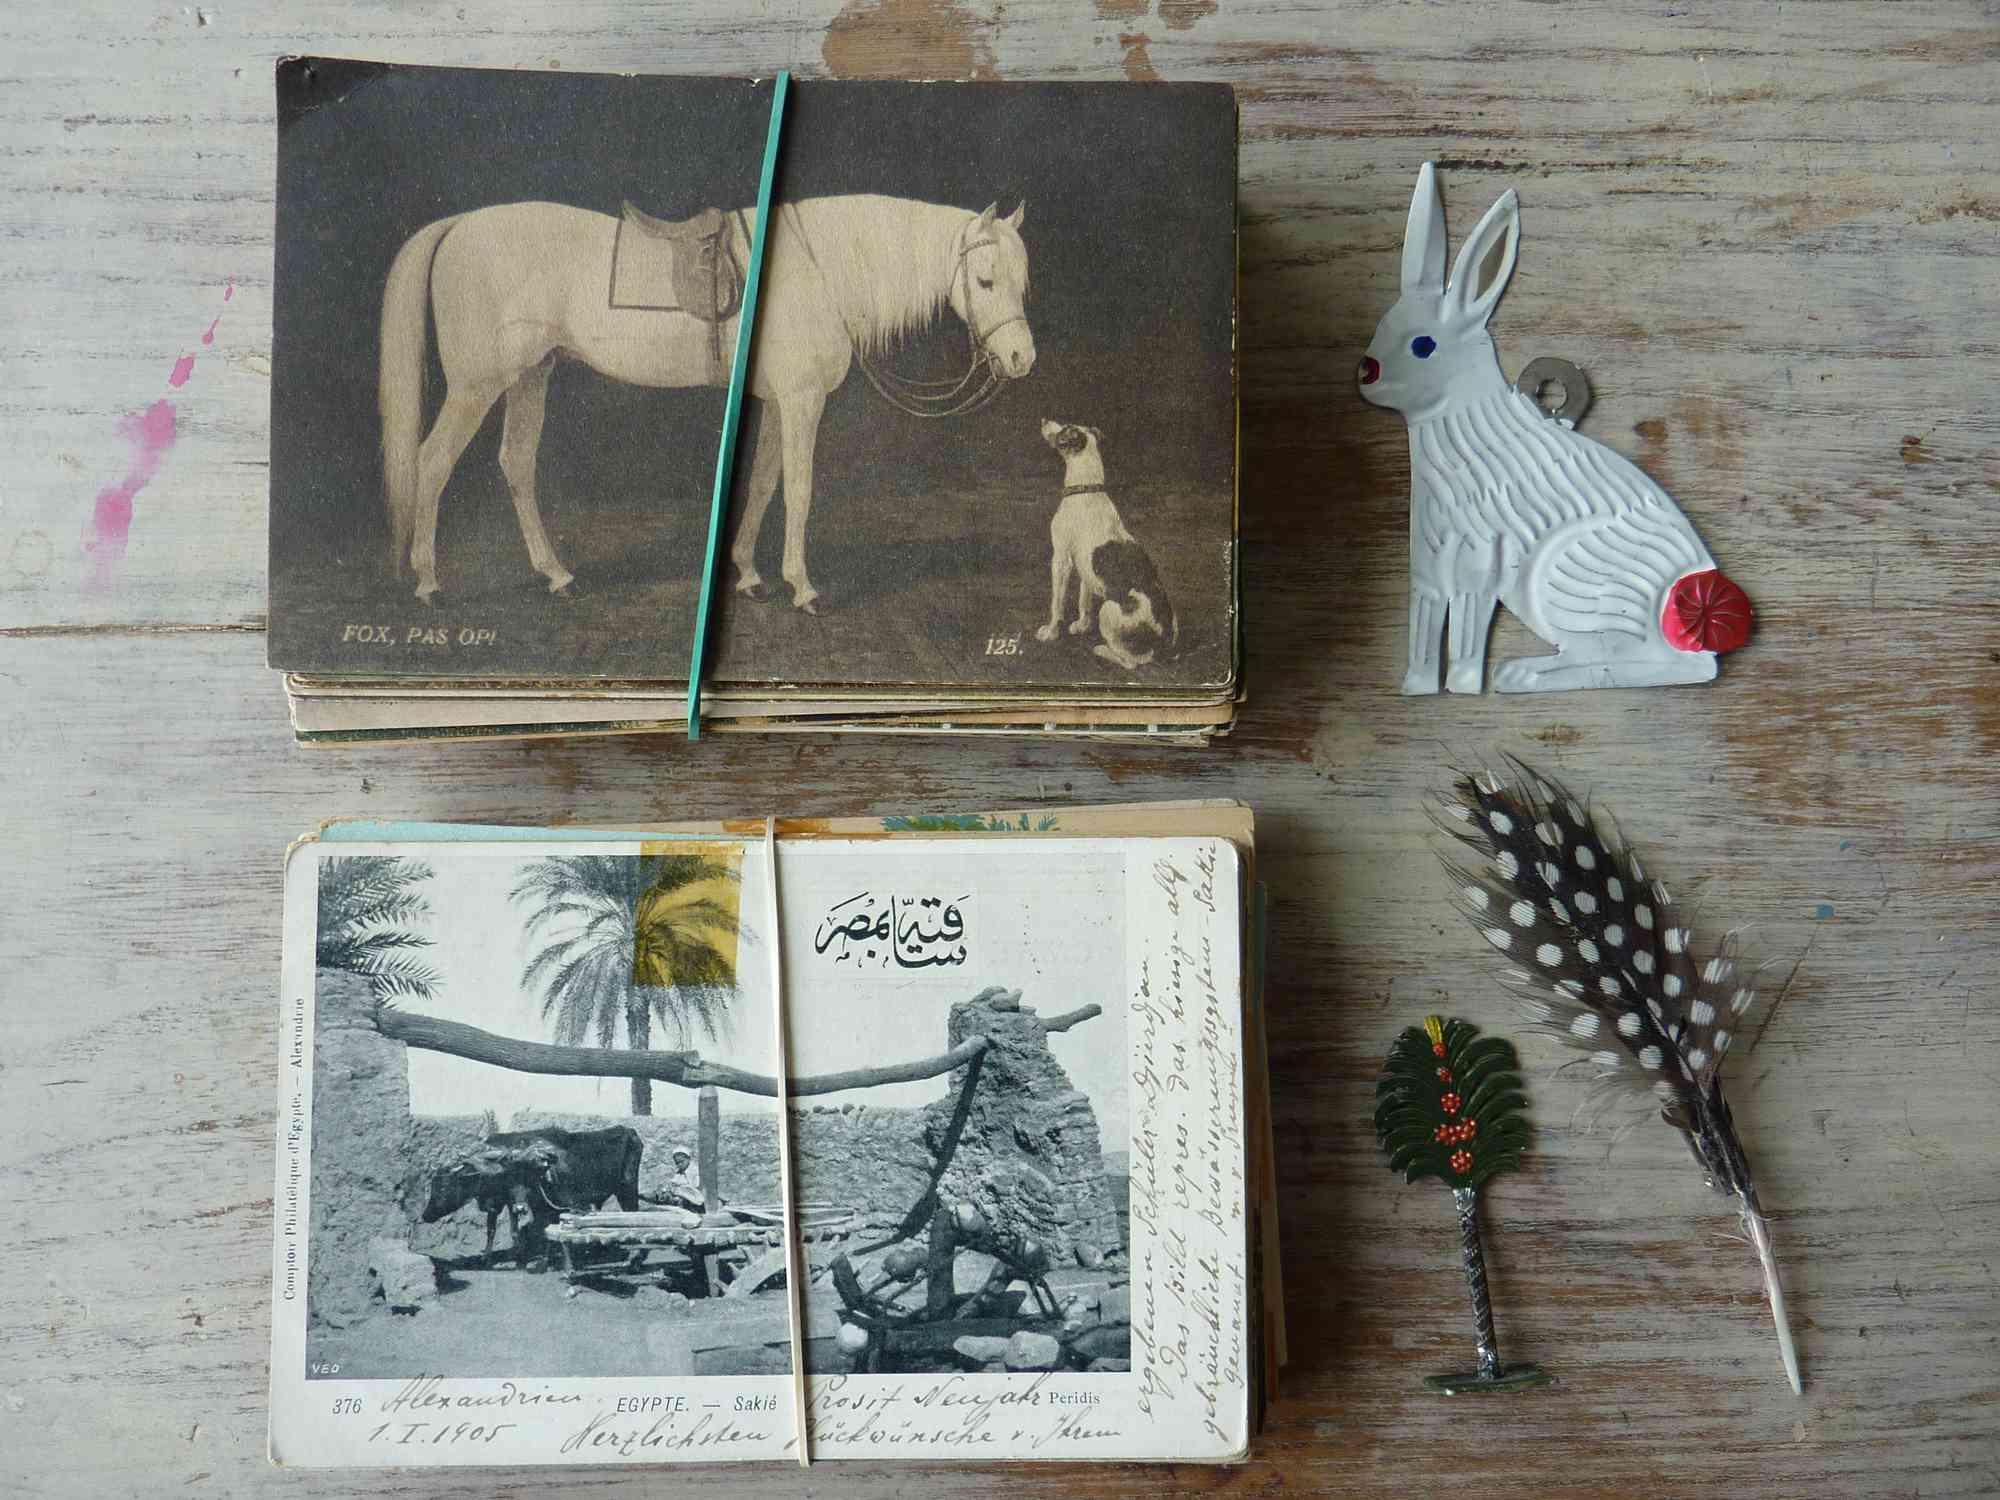 Rubber bands around vintage postcards